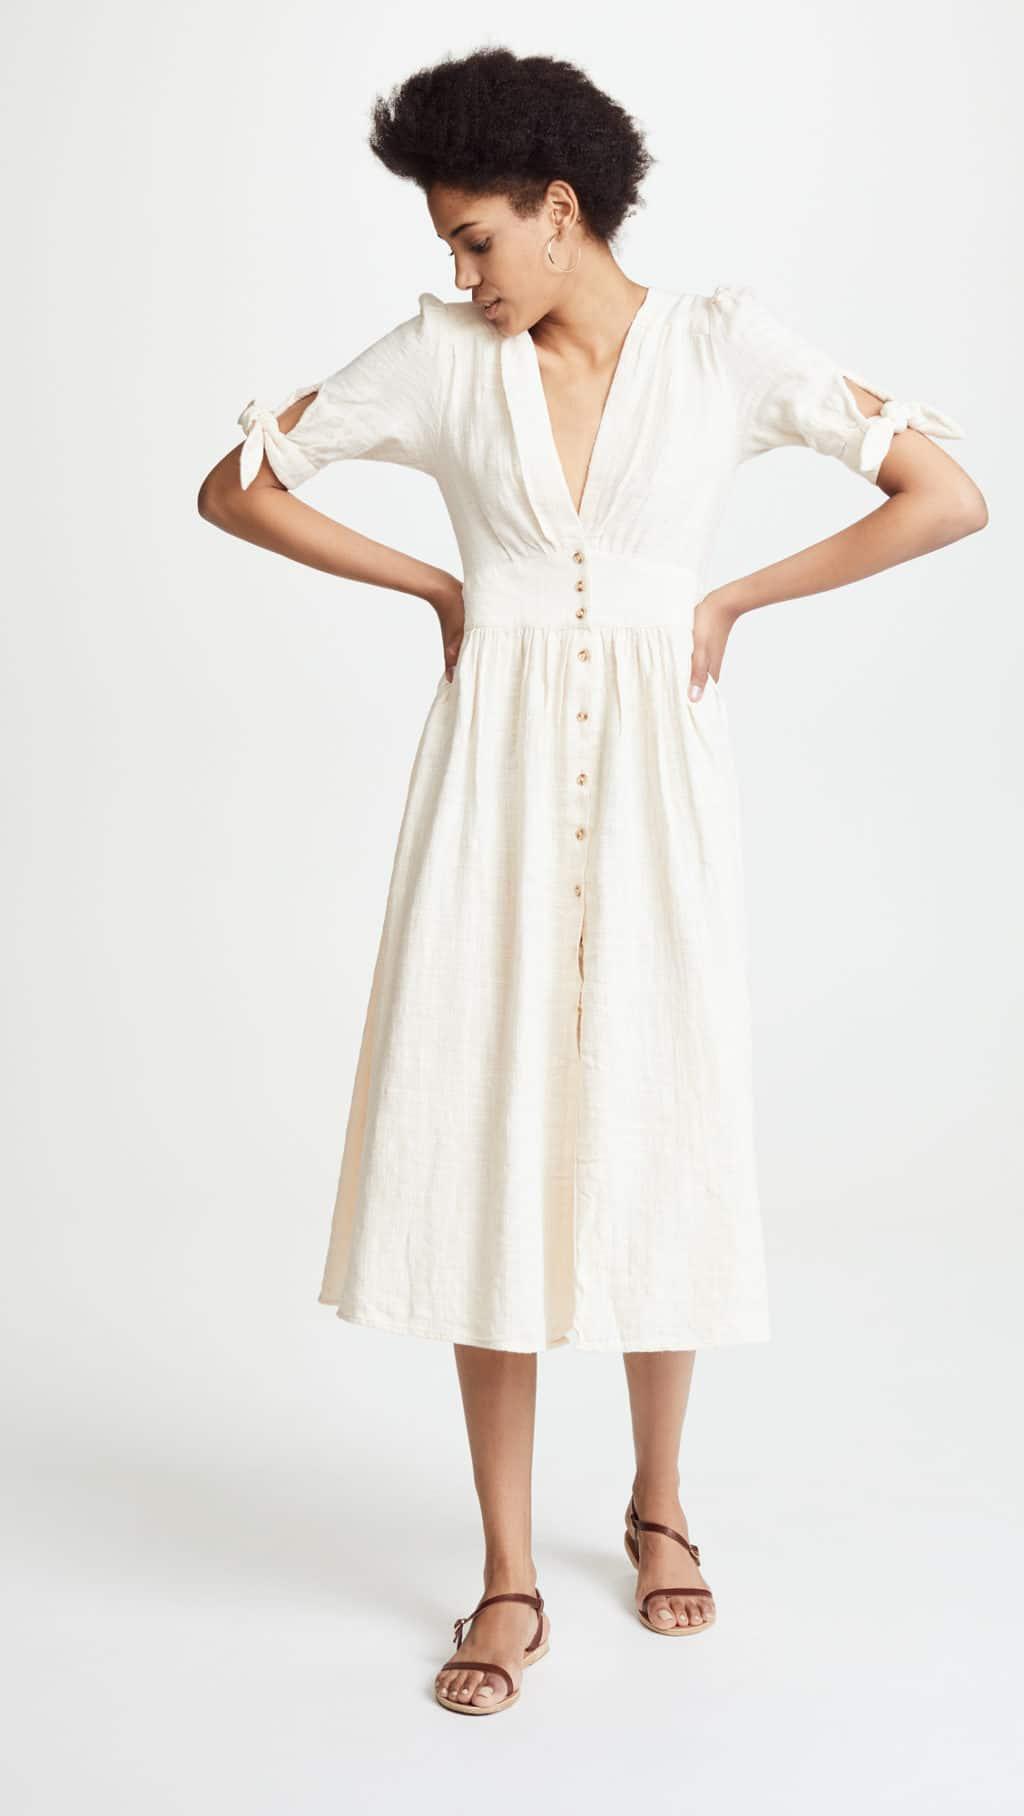 FREE PEOPLE Love Of My Life Ivory Dress